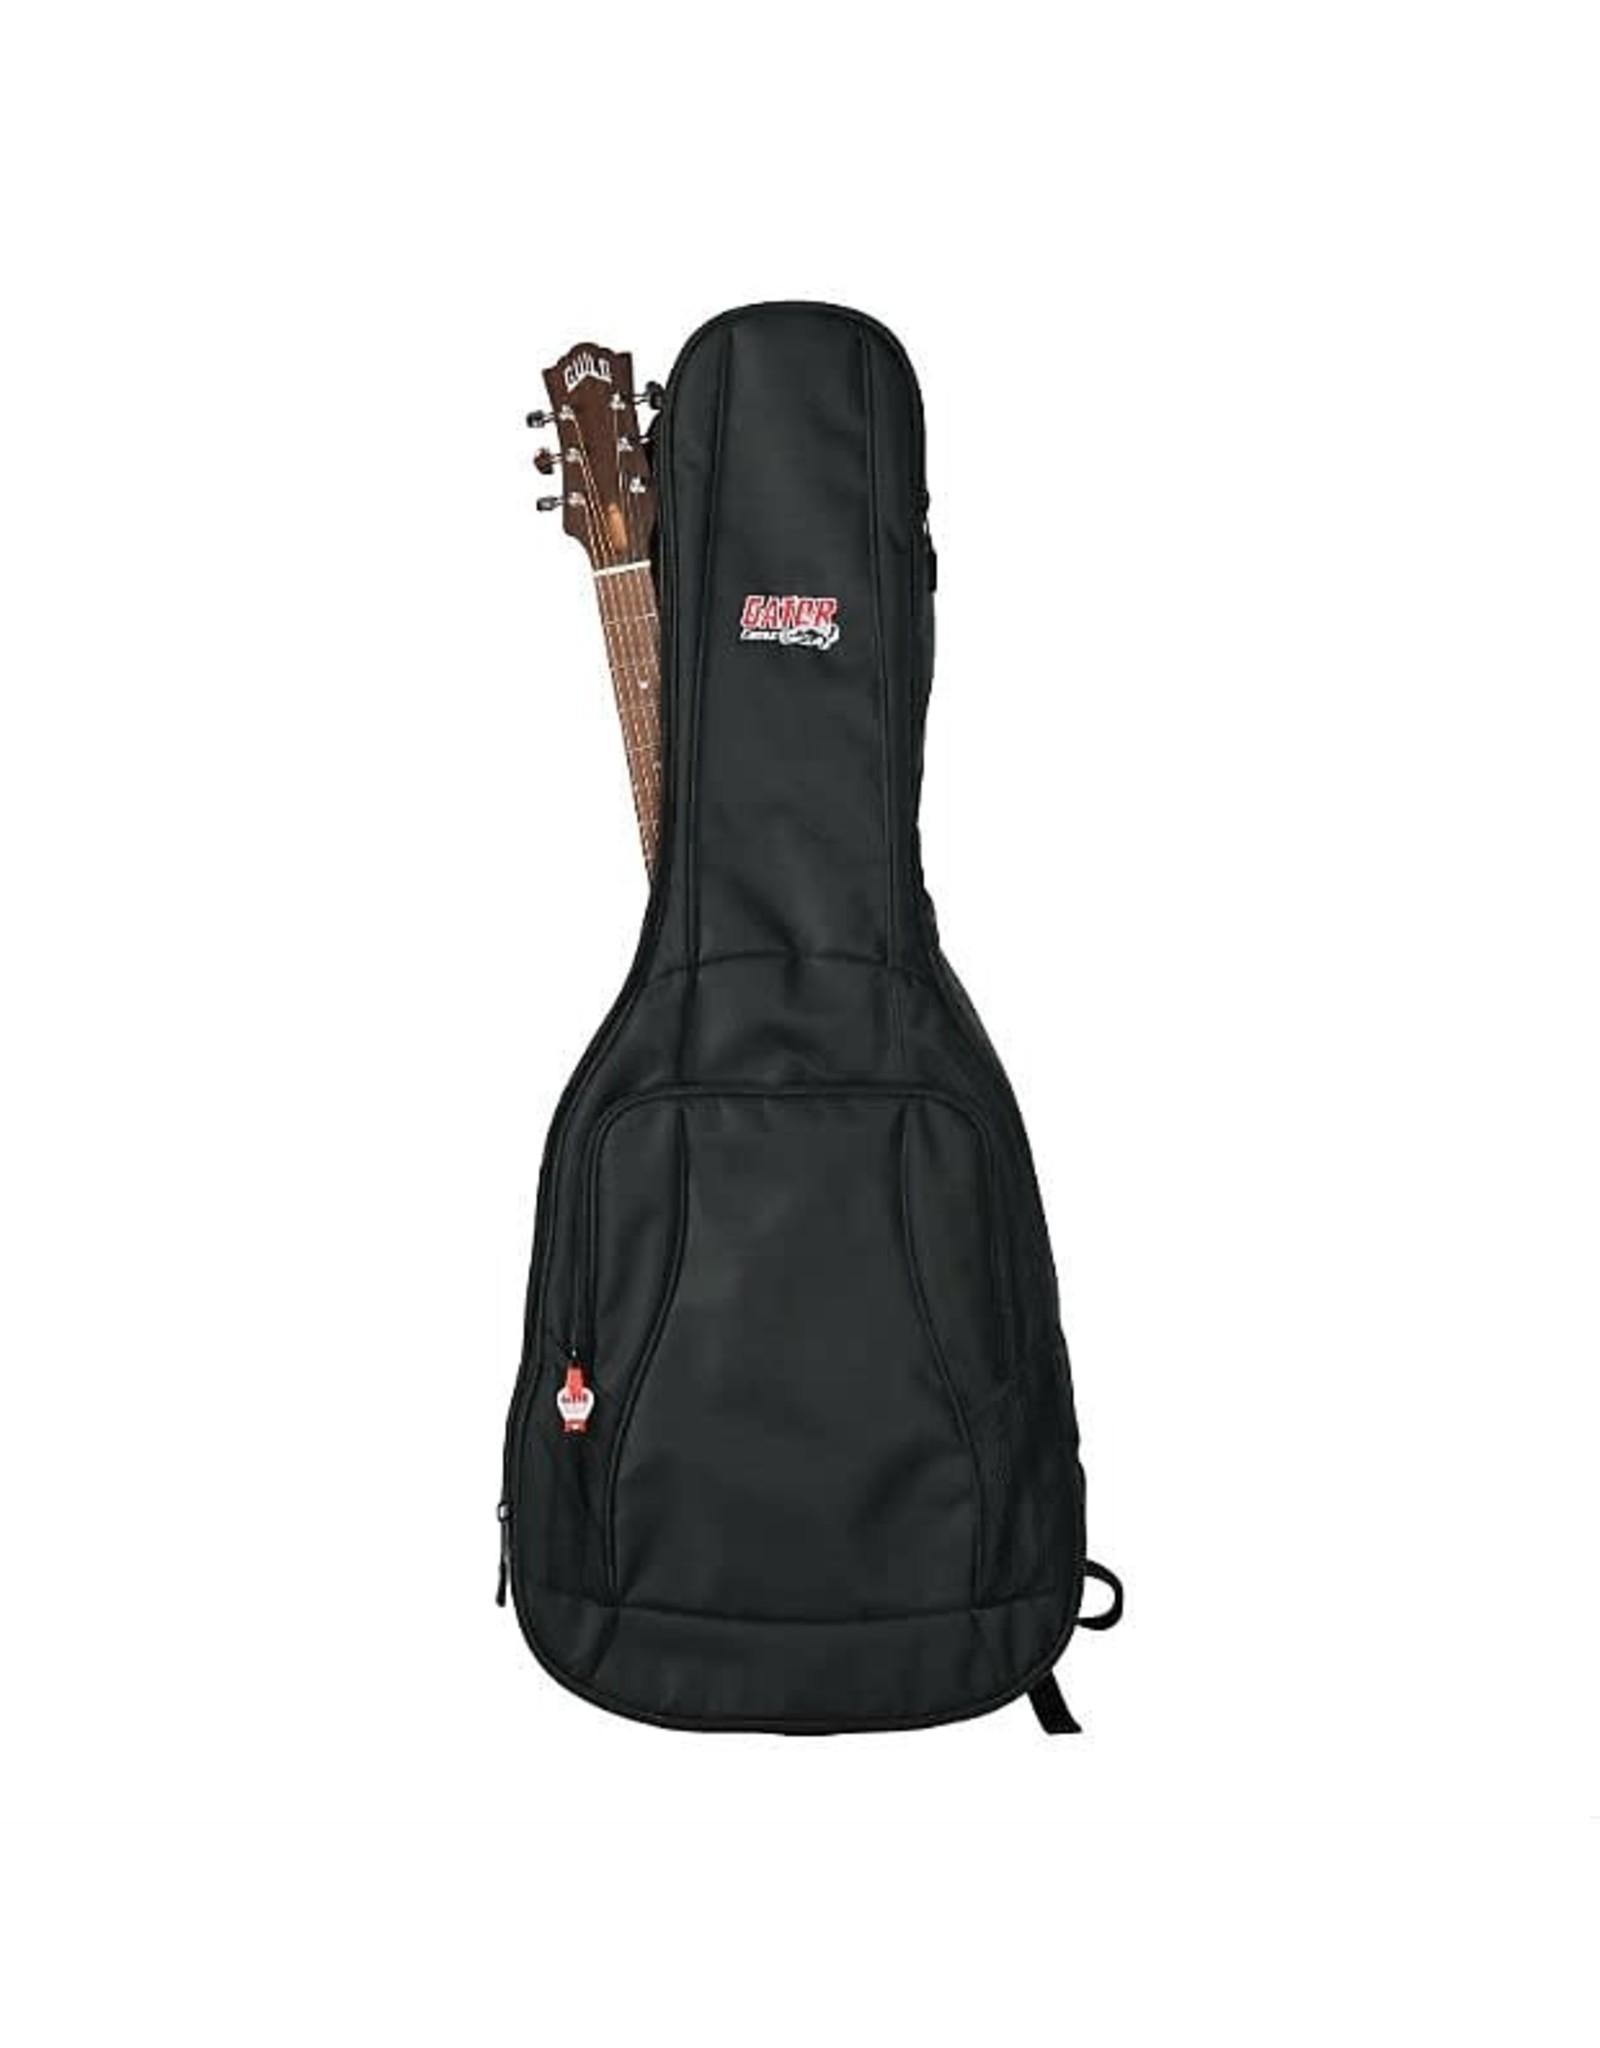 Gator Gator 4G SERIES Acoustic Guitar Gig Bag GB-4G-ACOUSTIC